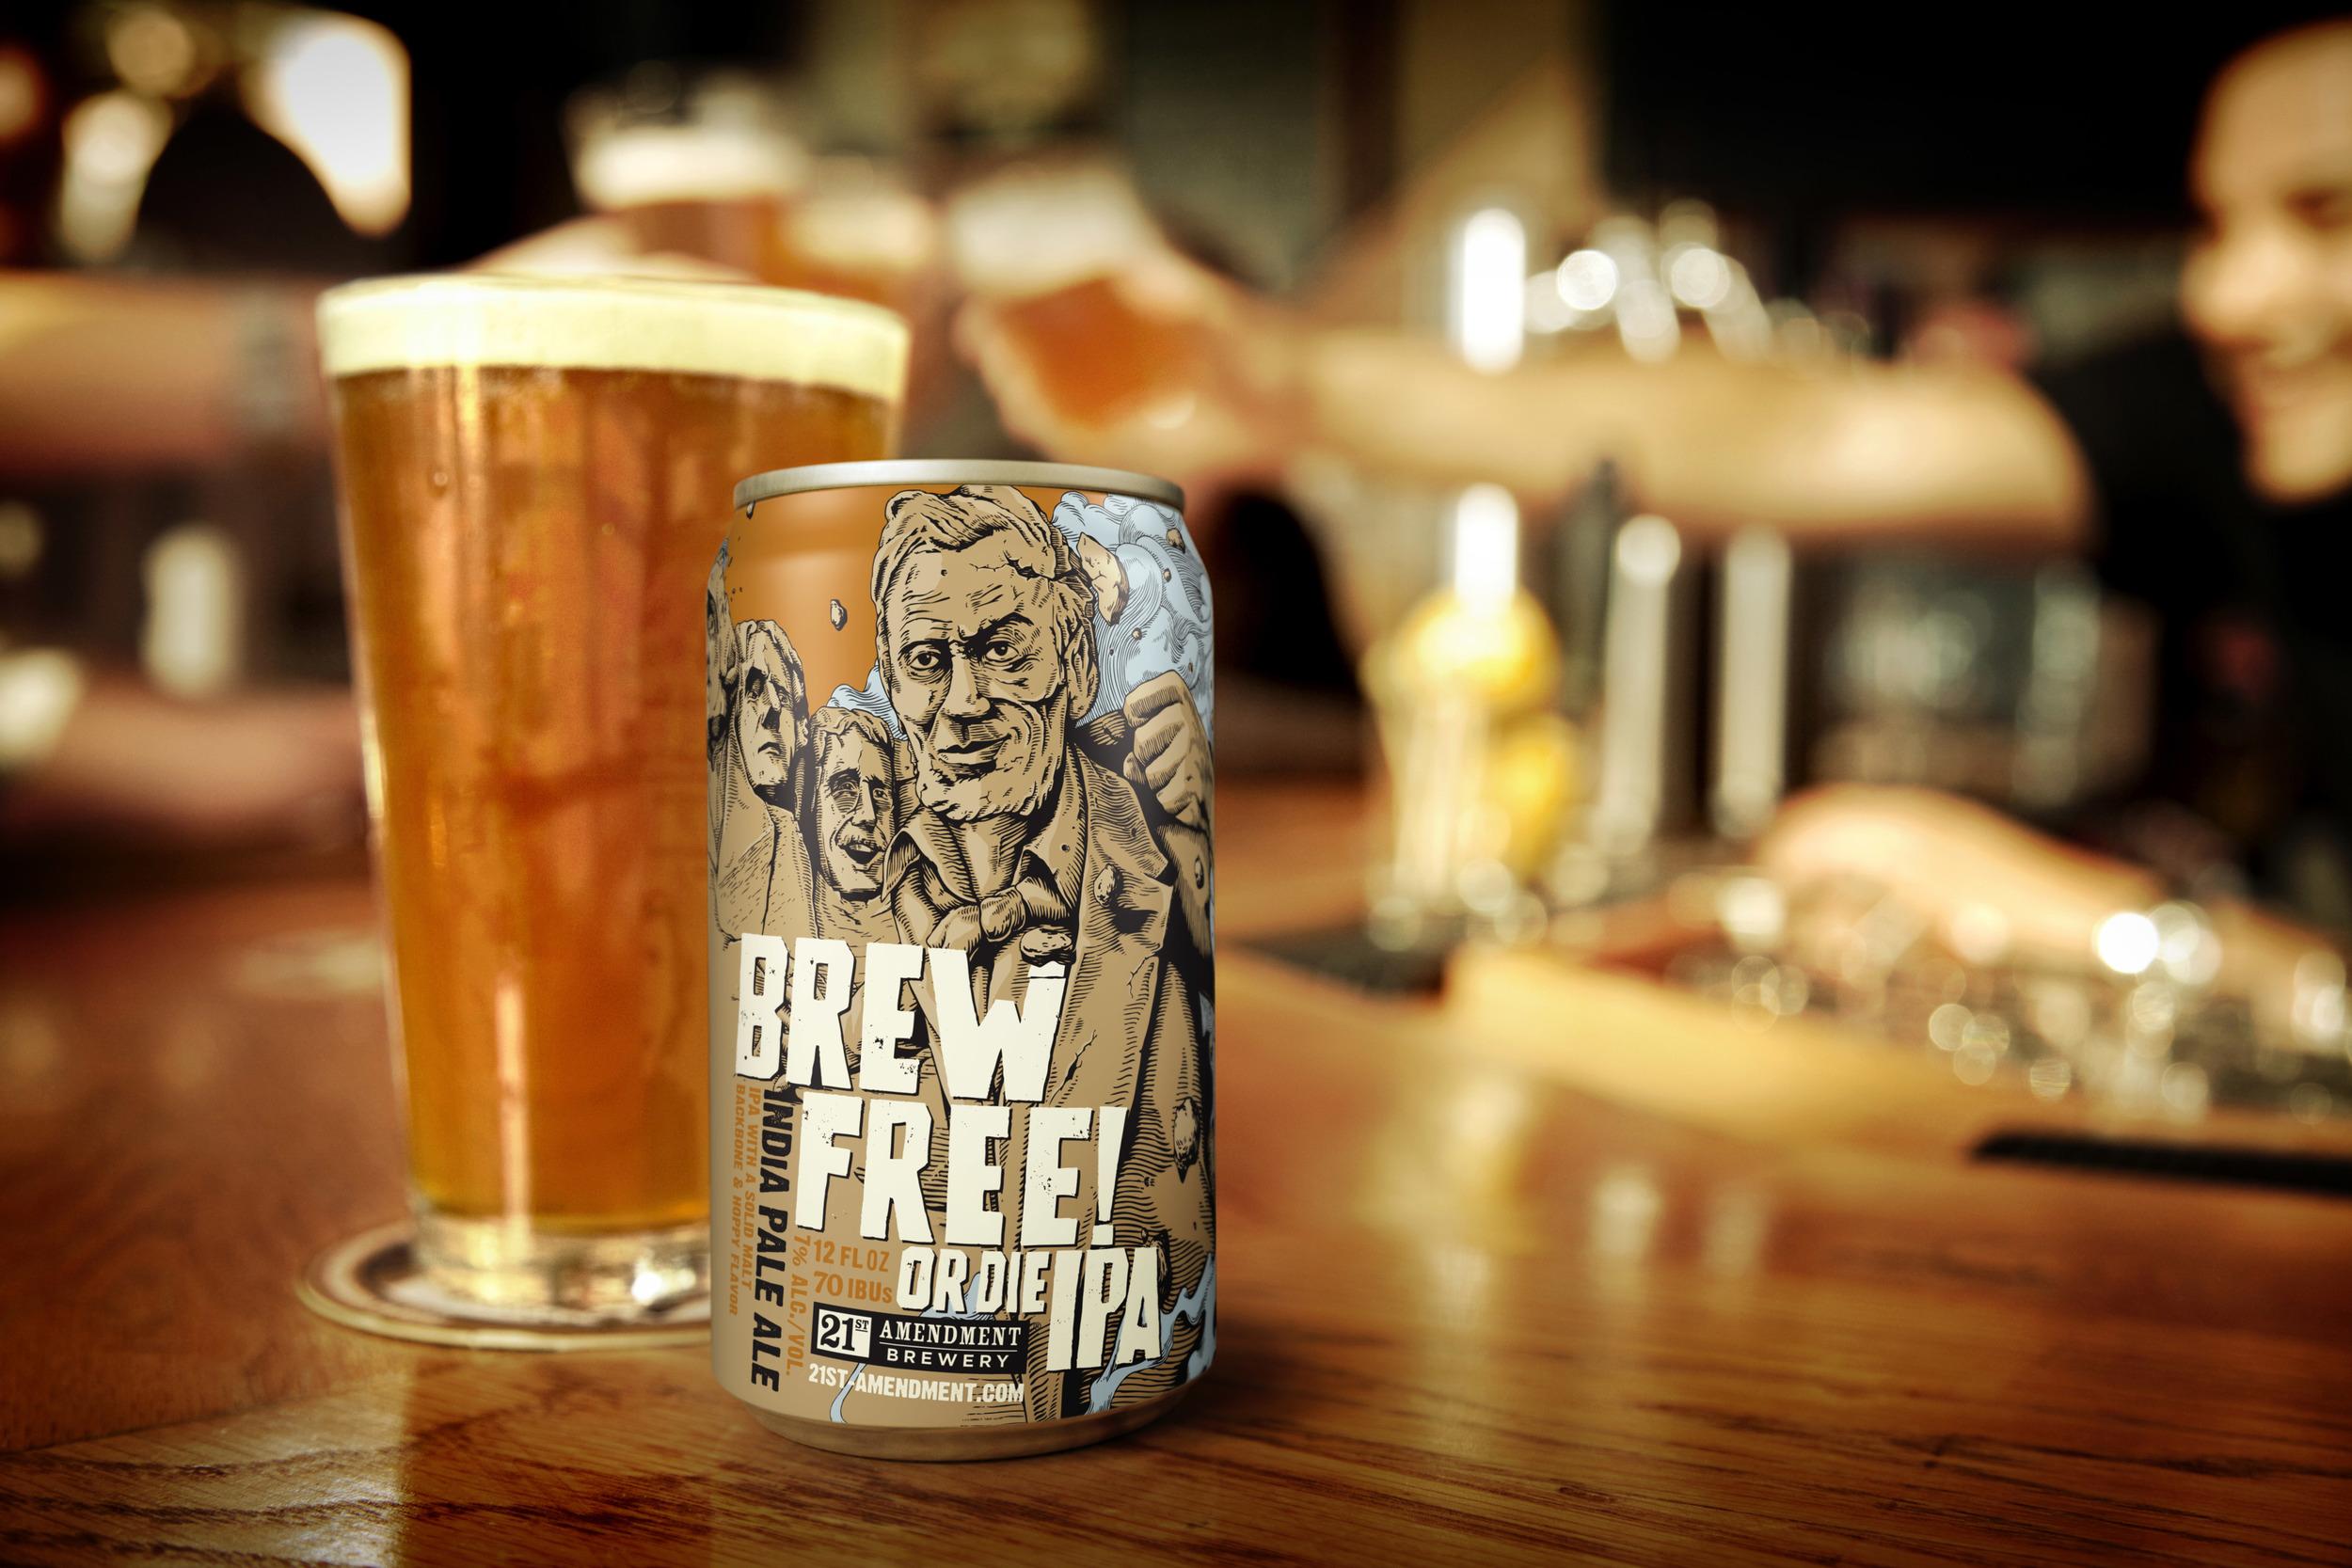 Beer & Branding: 21st Amendment Brewery